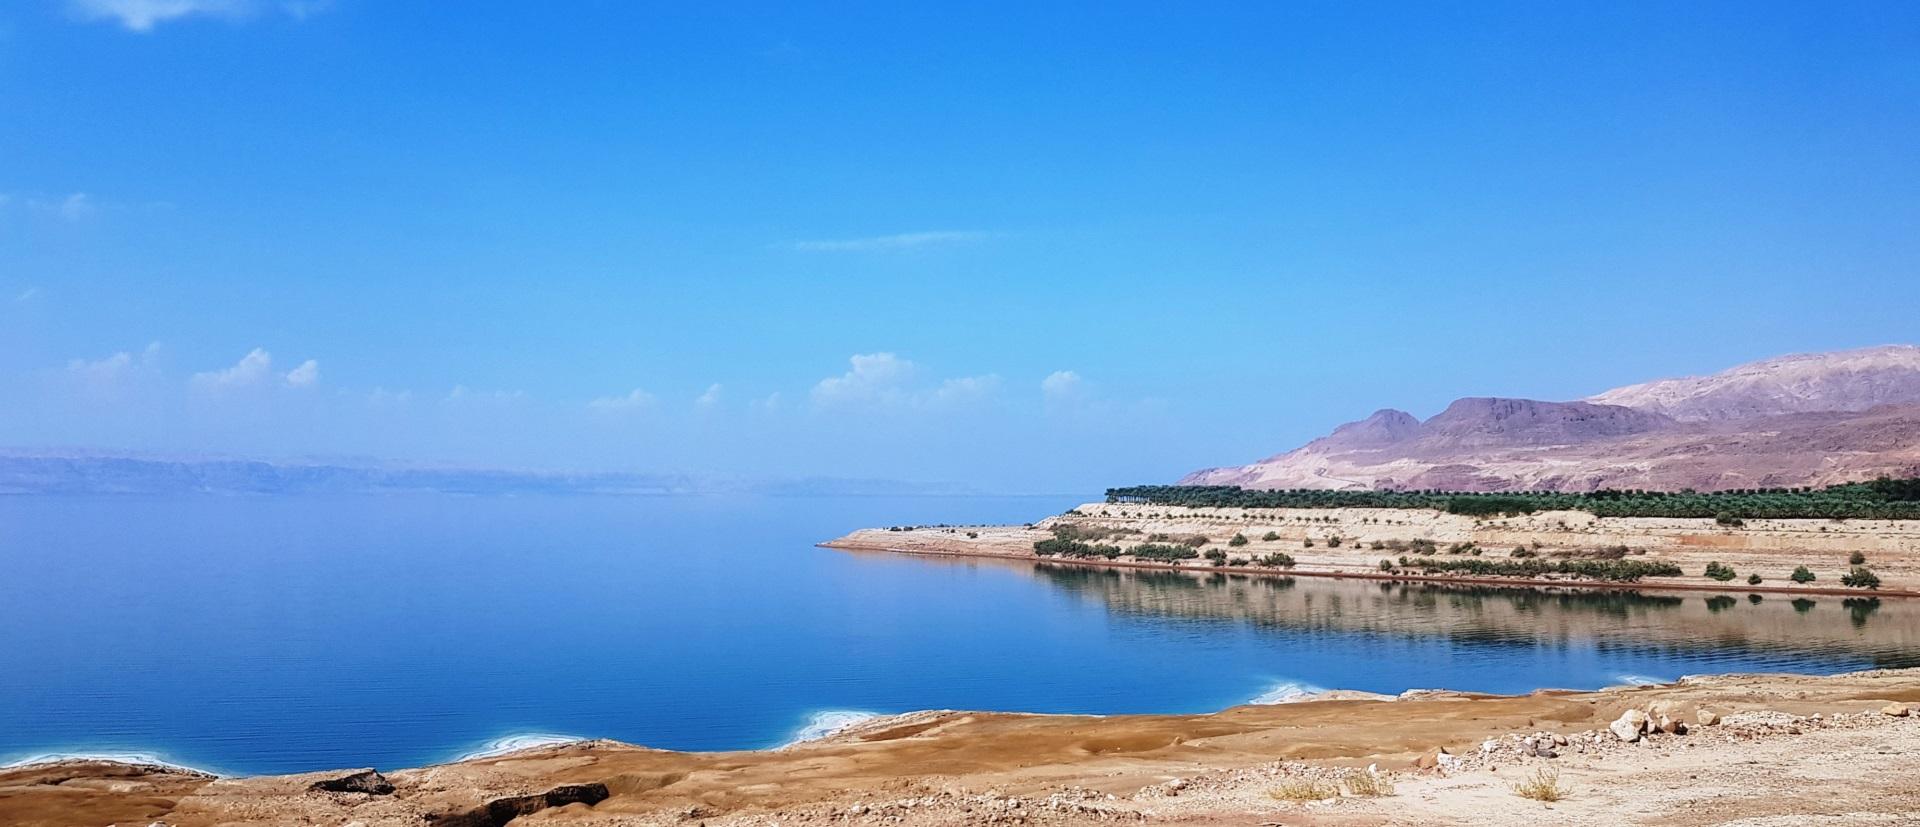 Visiter La mer Morte - Jordanie